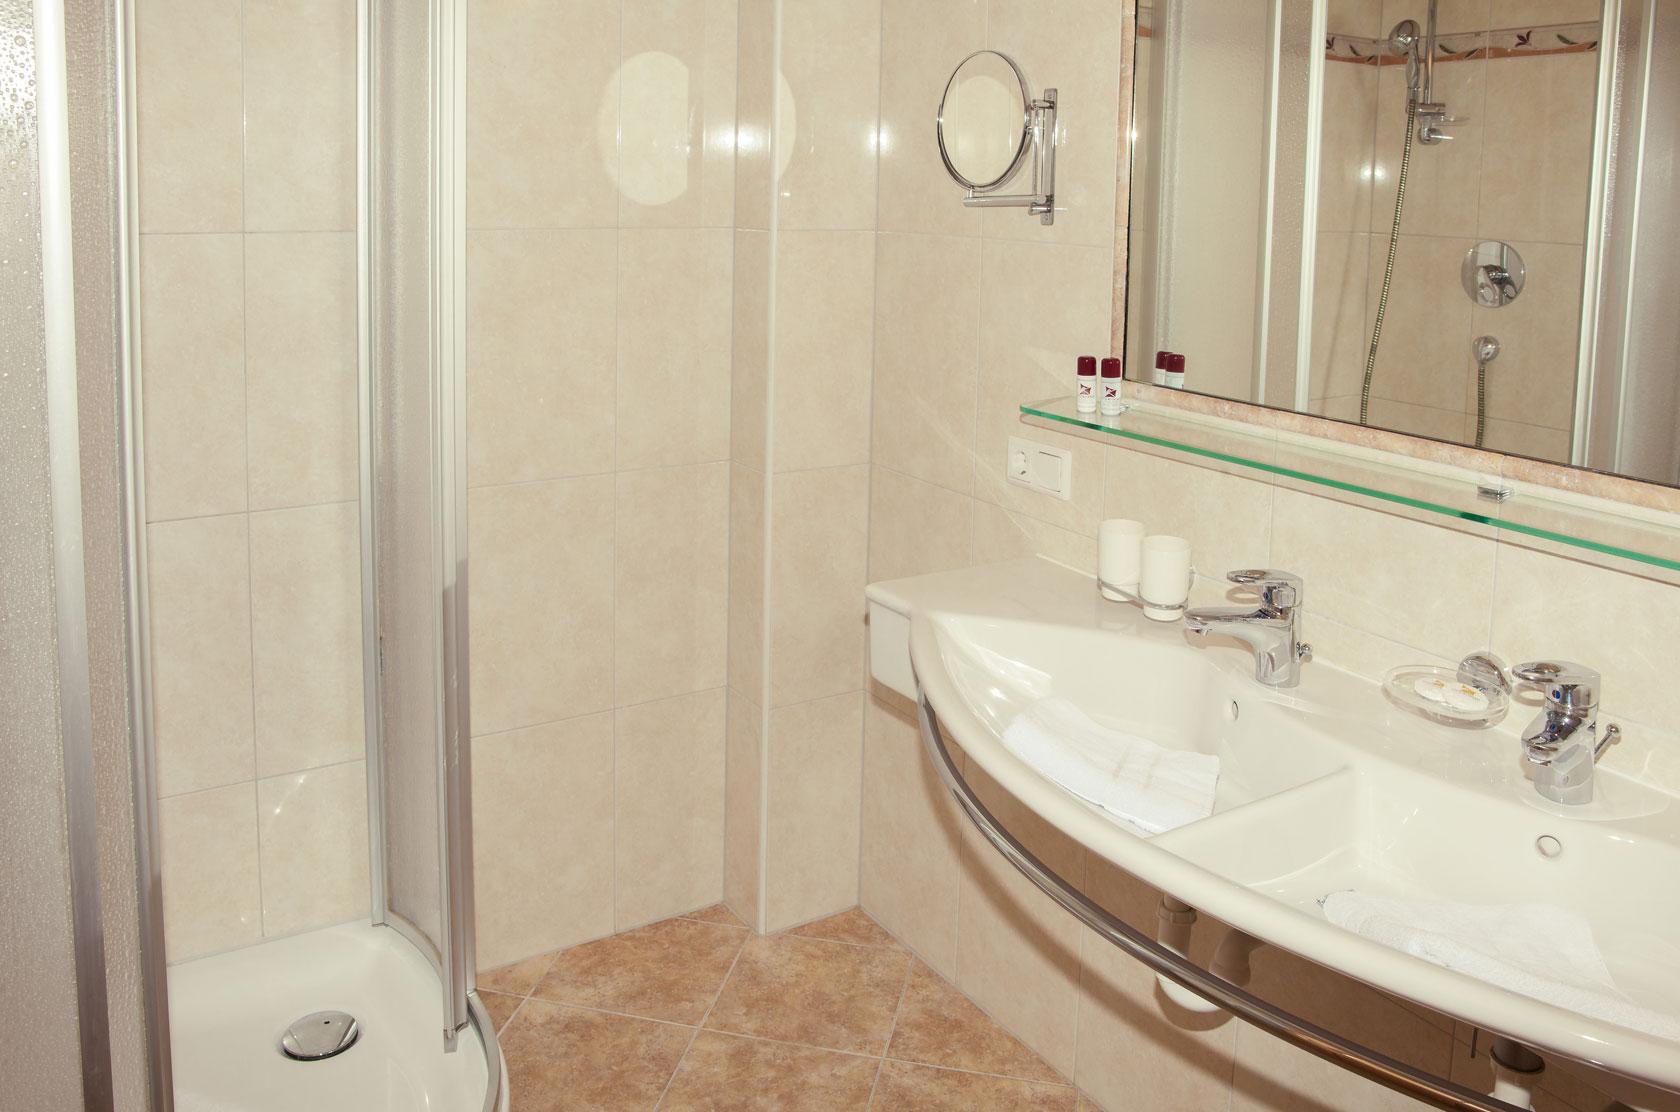 Hotelbad im Doppelzimmer Ahorn